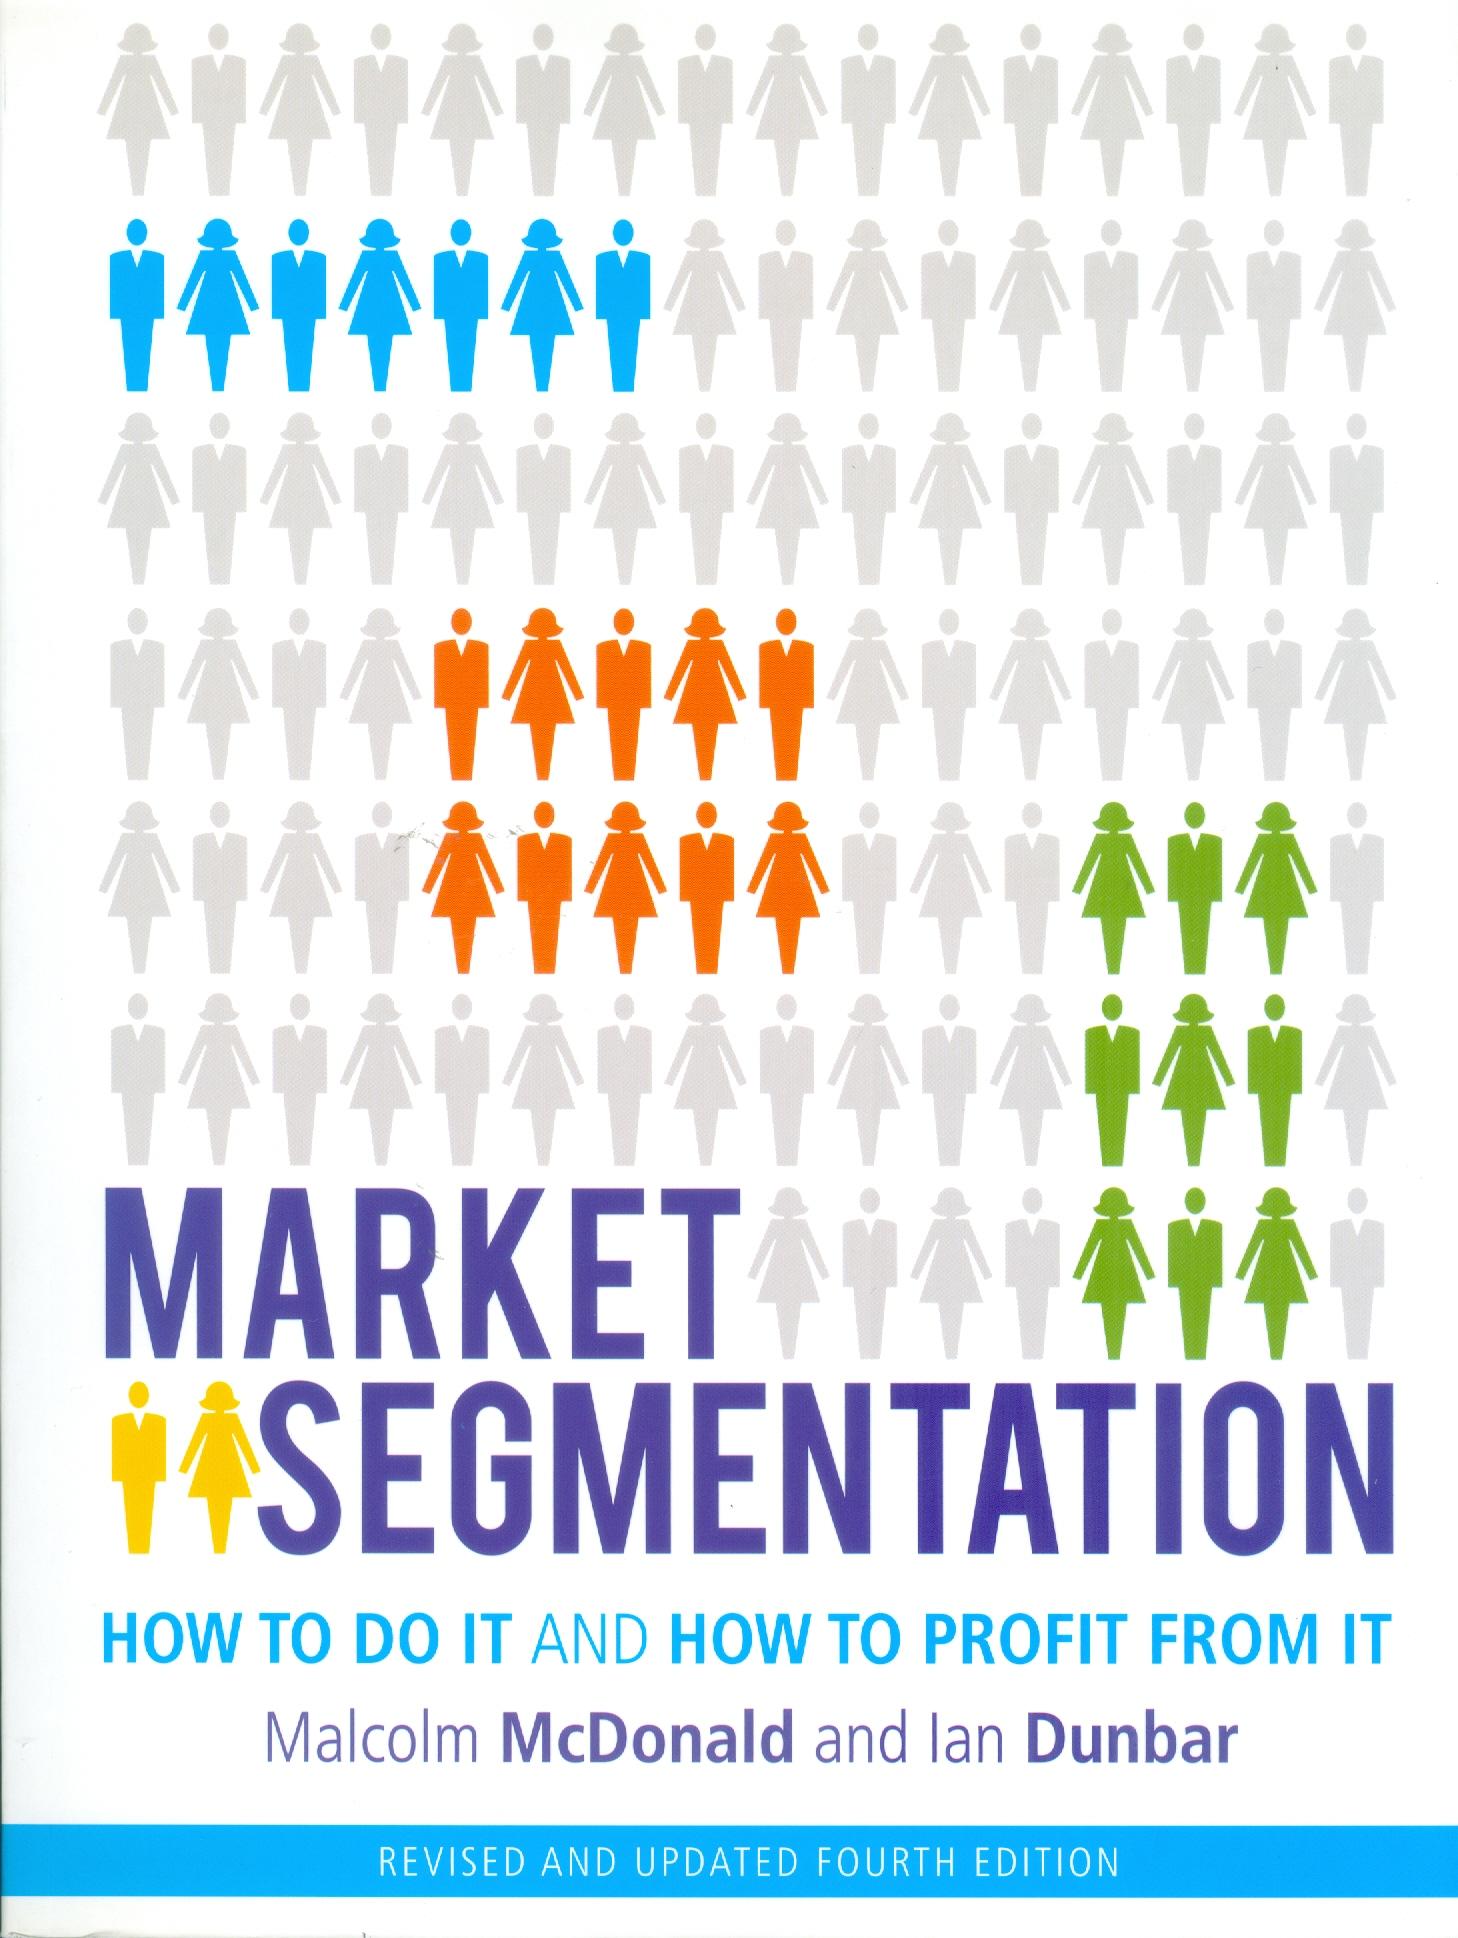 Market segmentation0001.jpg